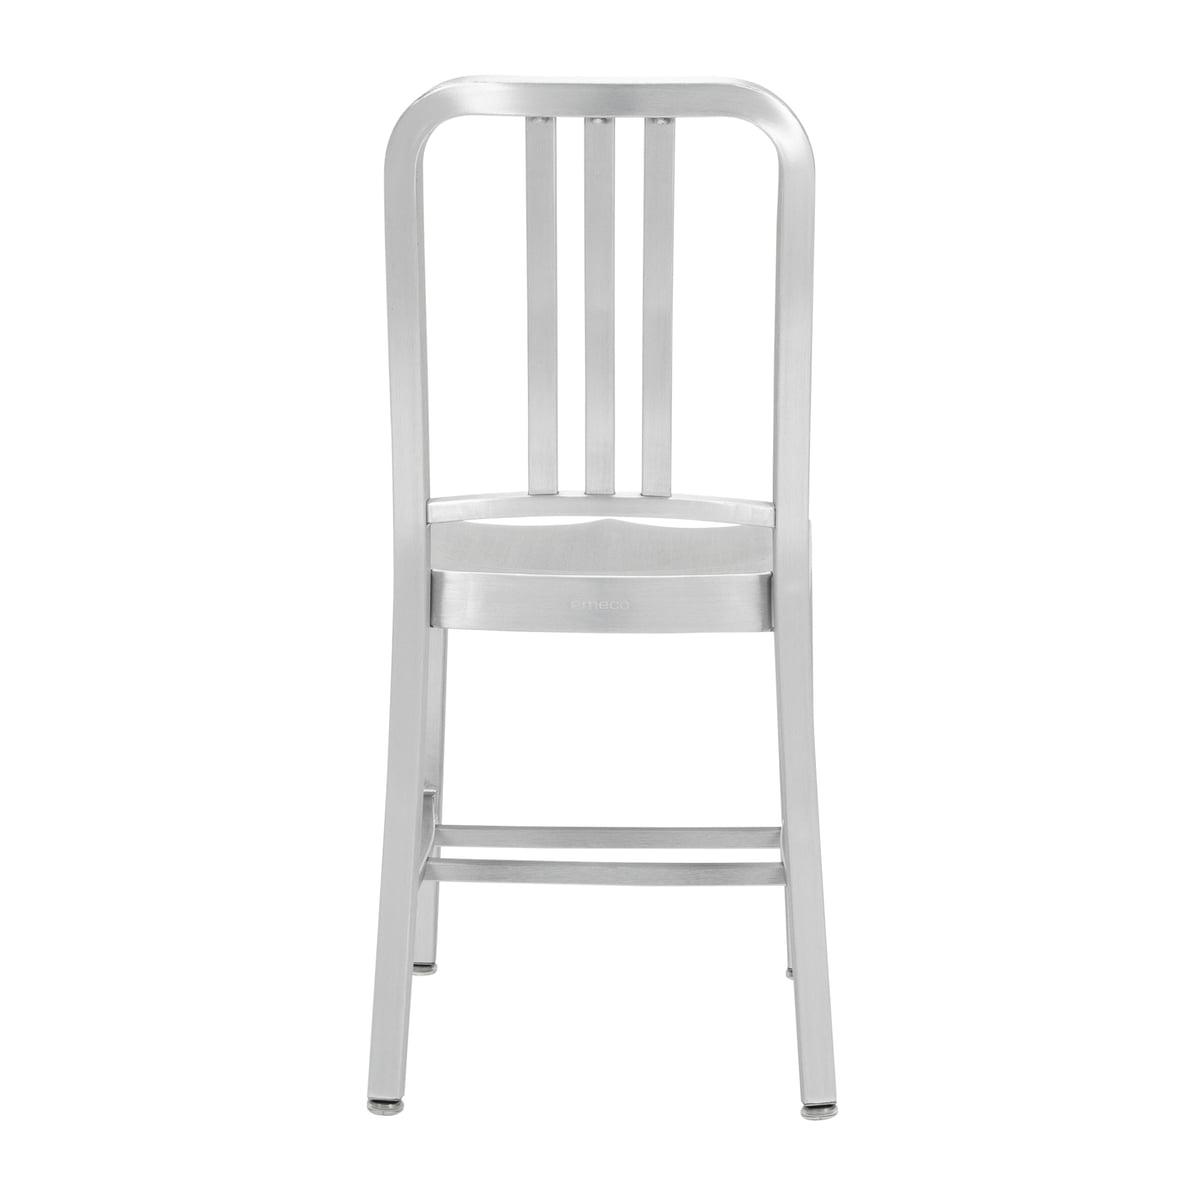 Emeco  Navy Chair  Emeco  Shop